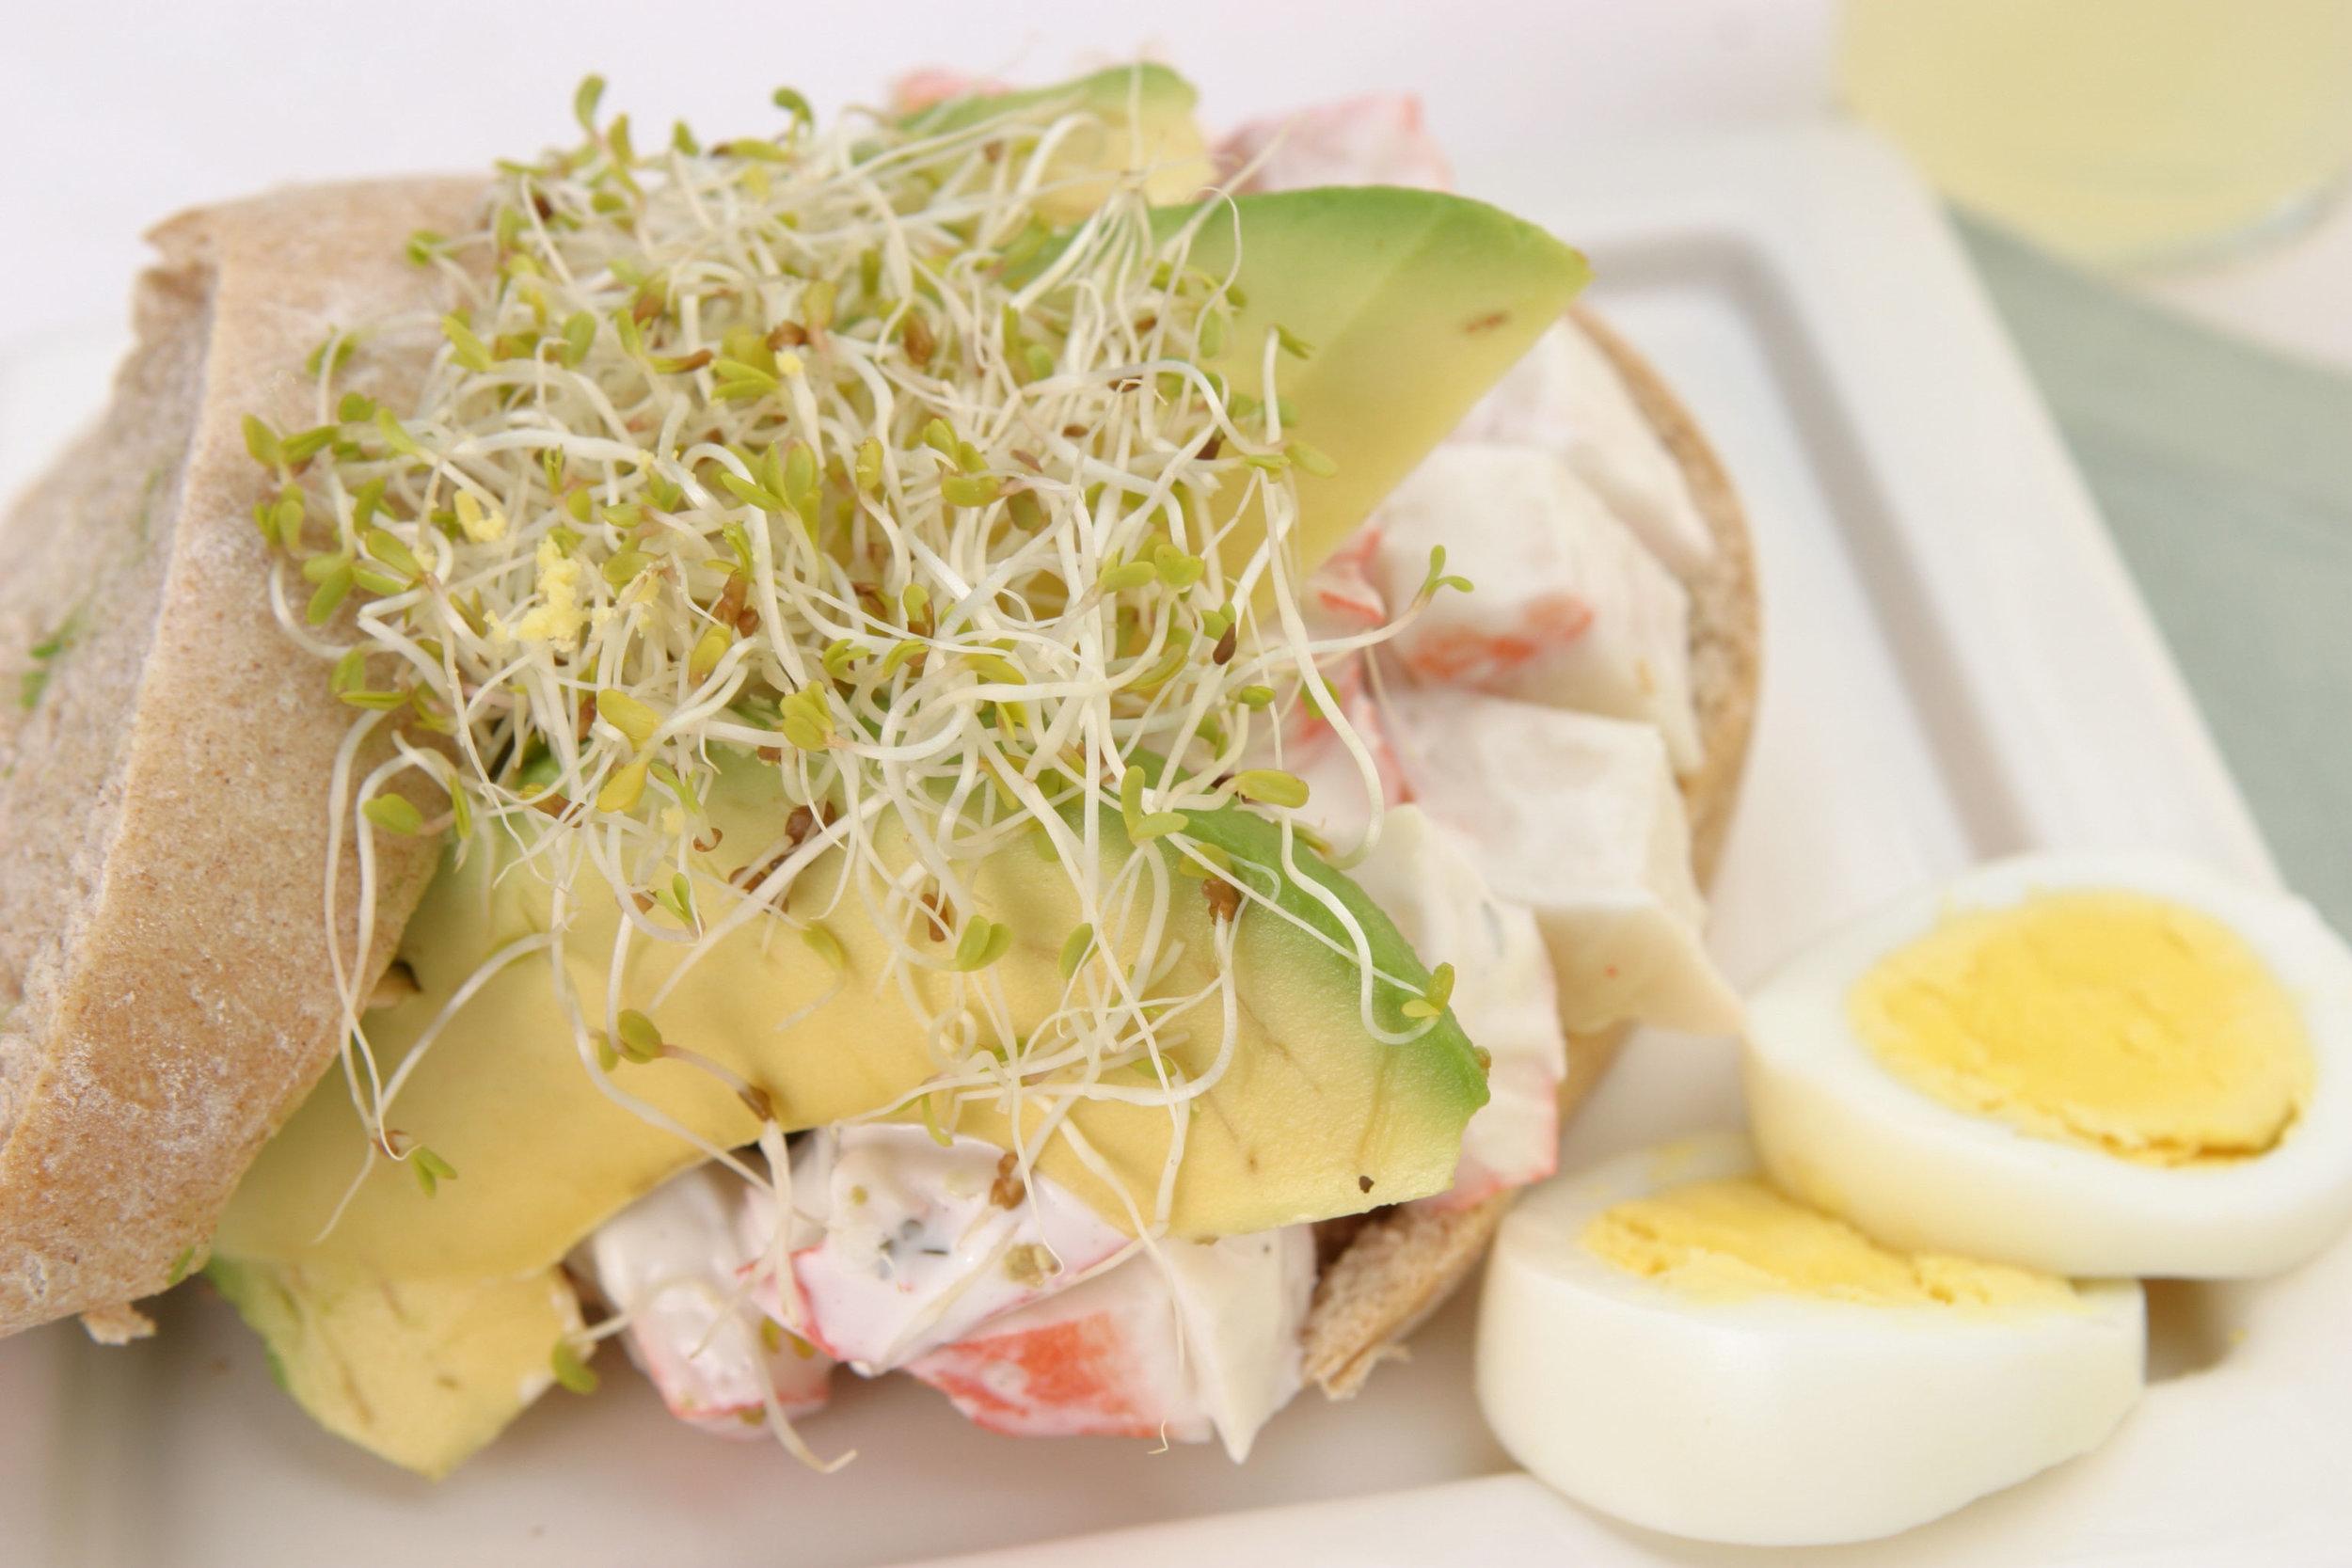 Alfalfa Sprout Sandwich -